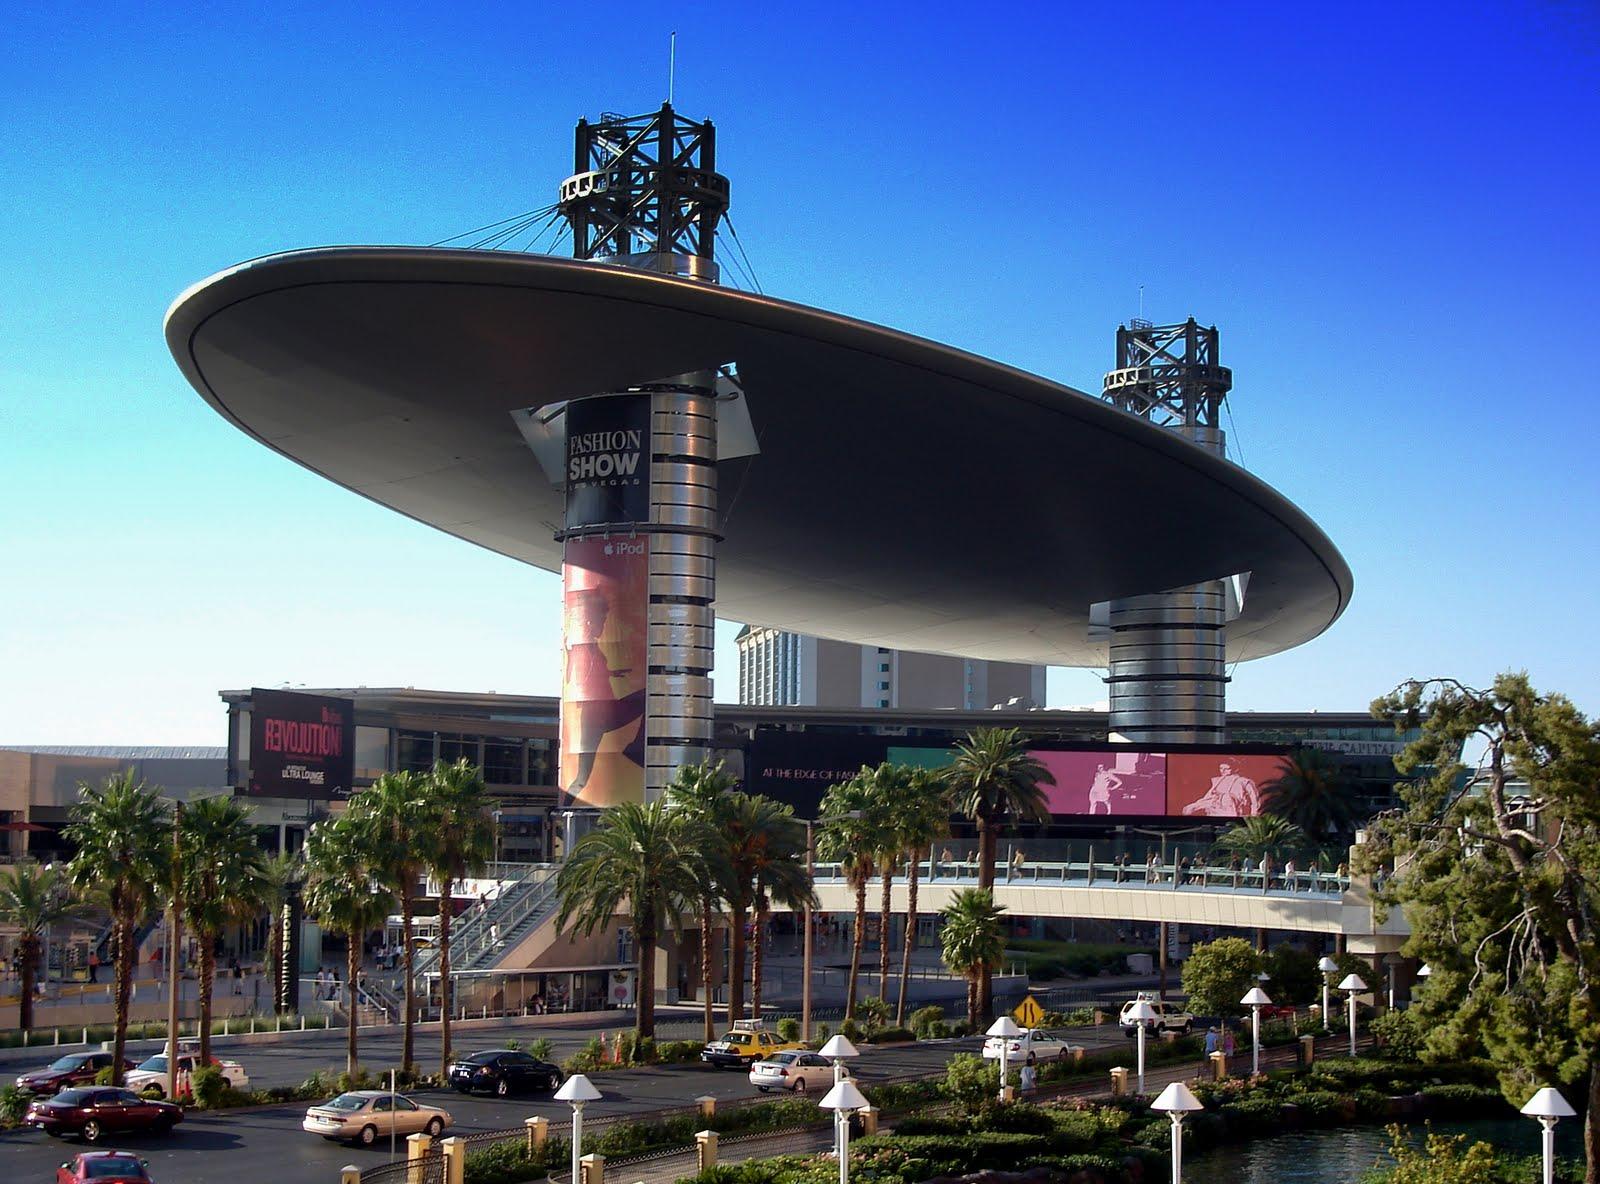 Fashion Show Mall Las Vegas Nevada Usa 2007